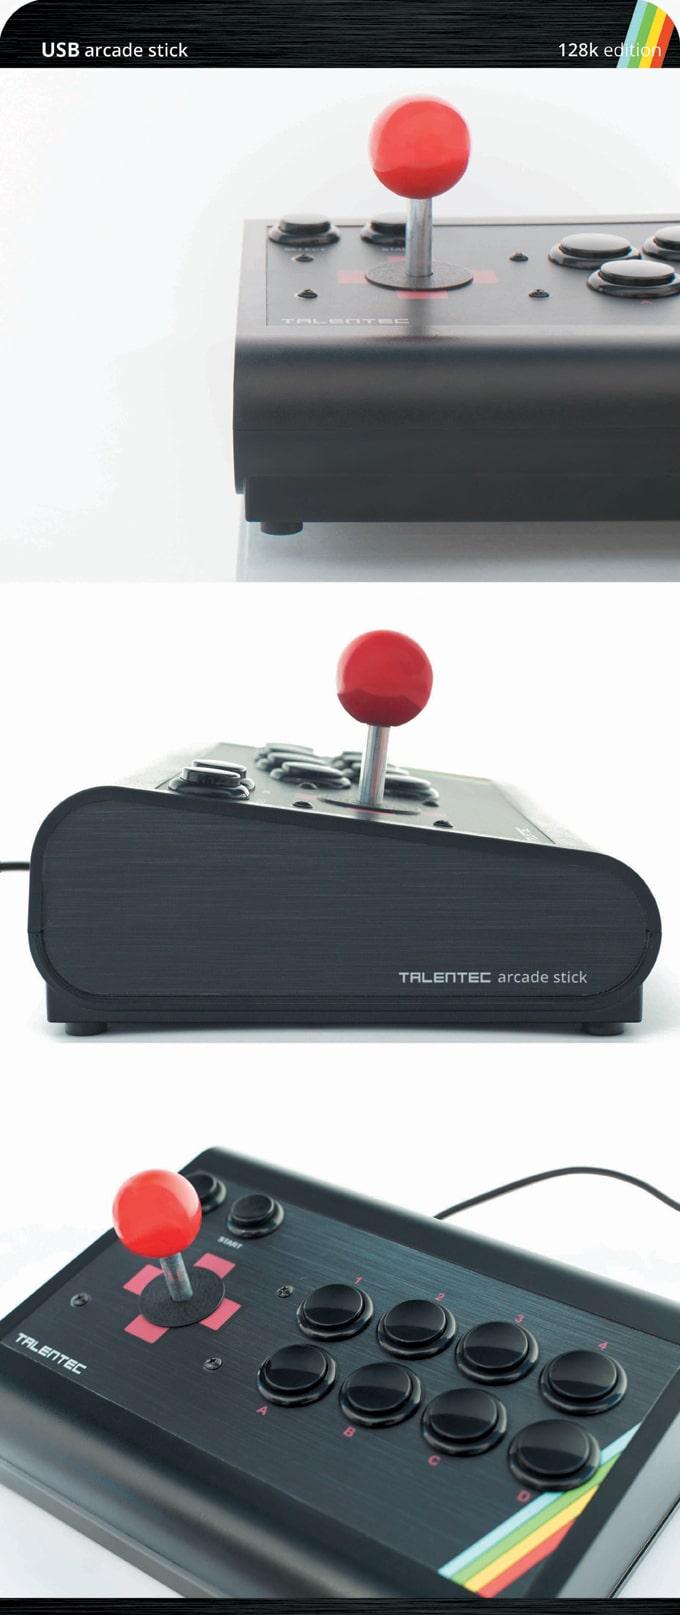 191022 Spectro USB arcade stick 1 - USB Arcade Stick - Spectro Edition - usb-arcade-stick-fr